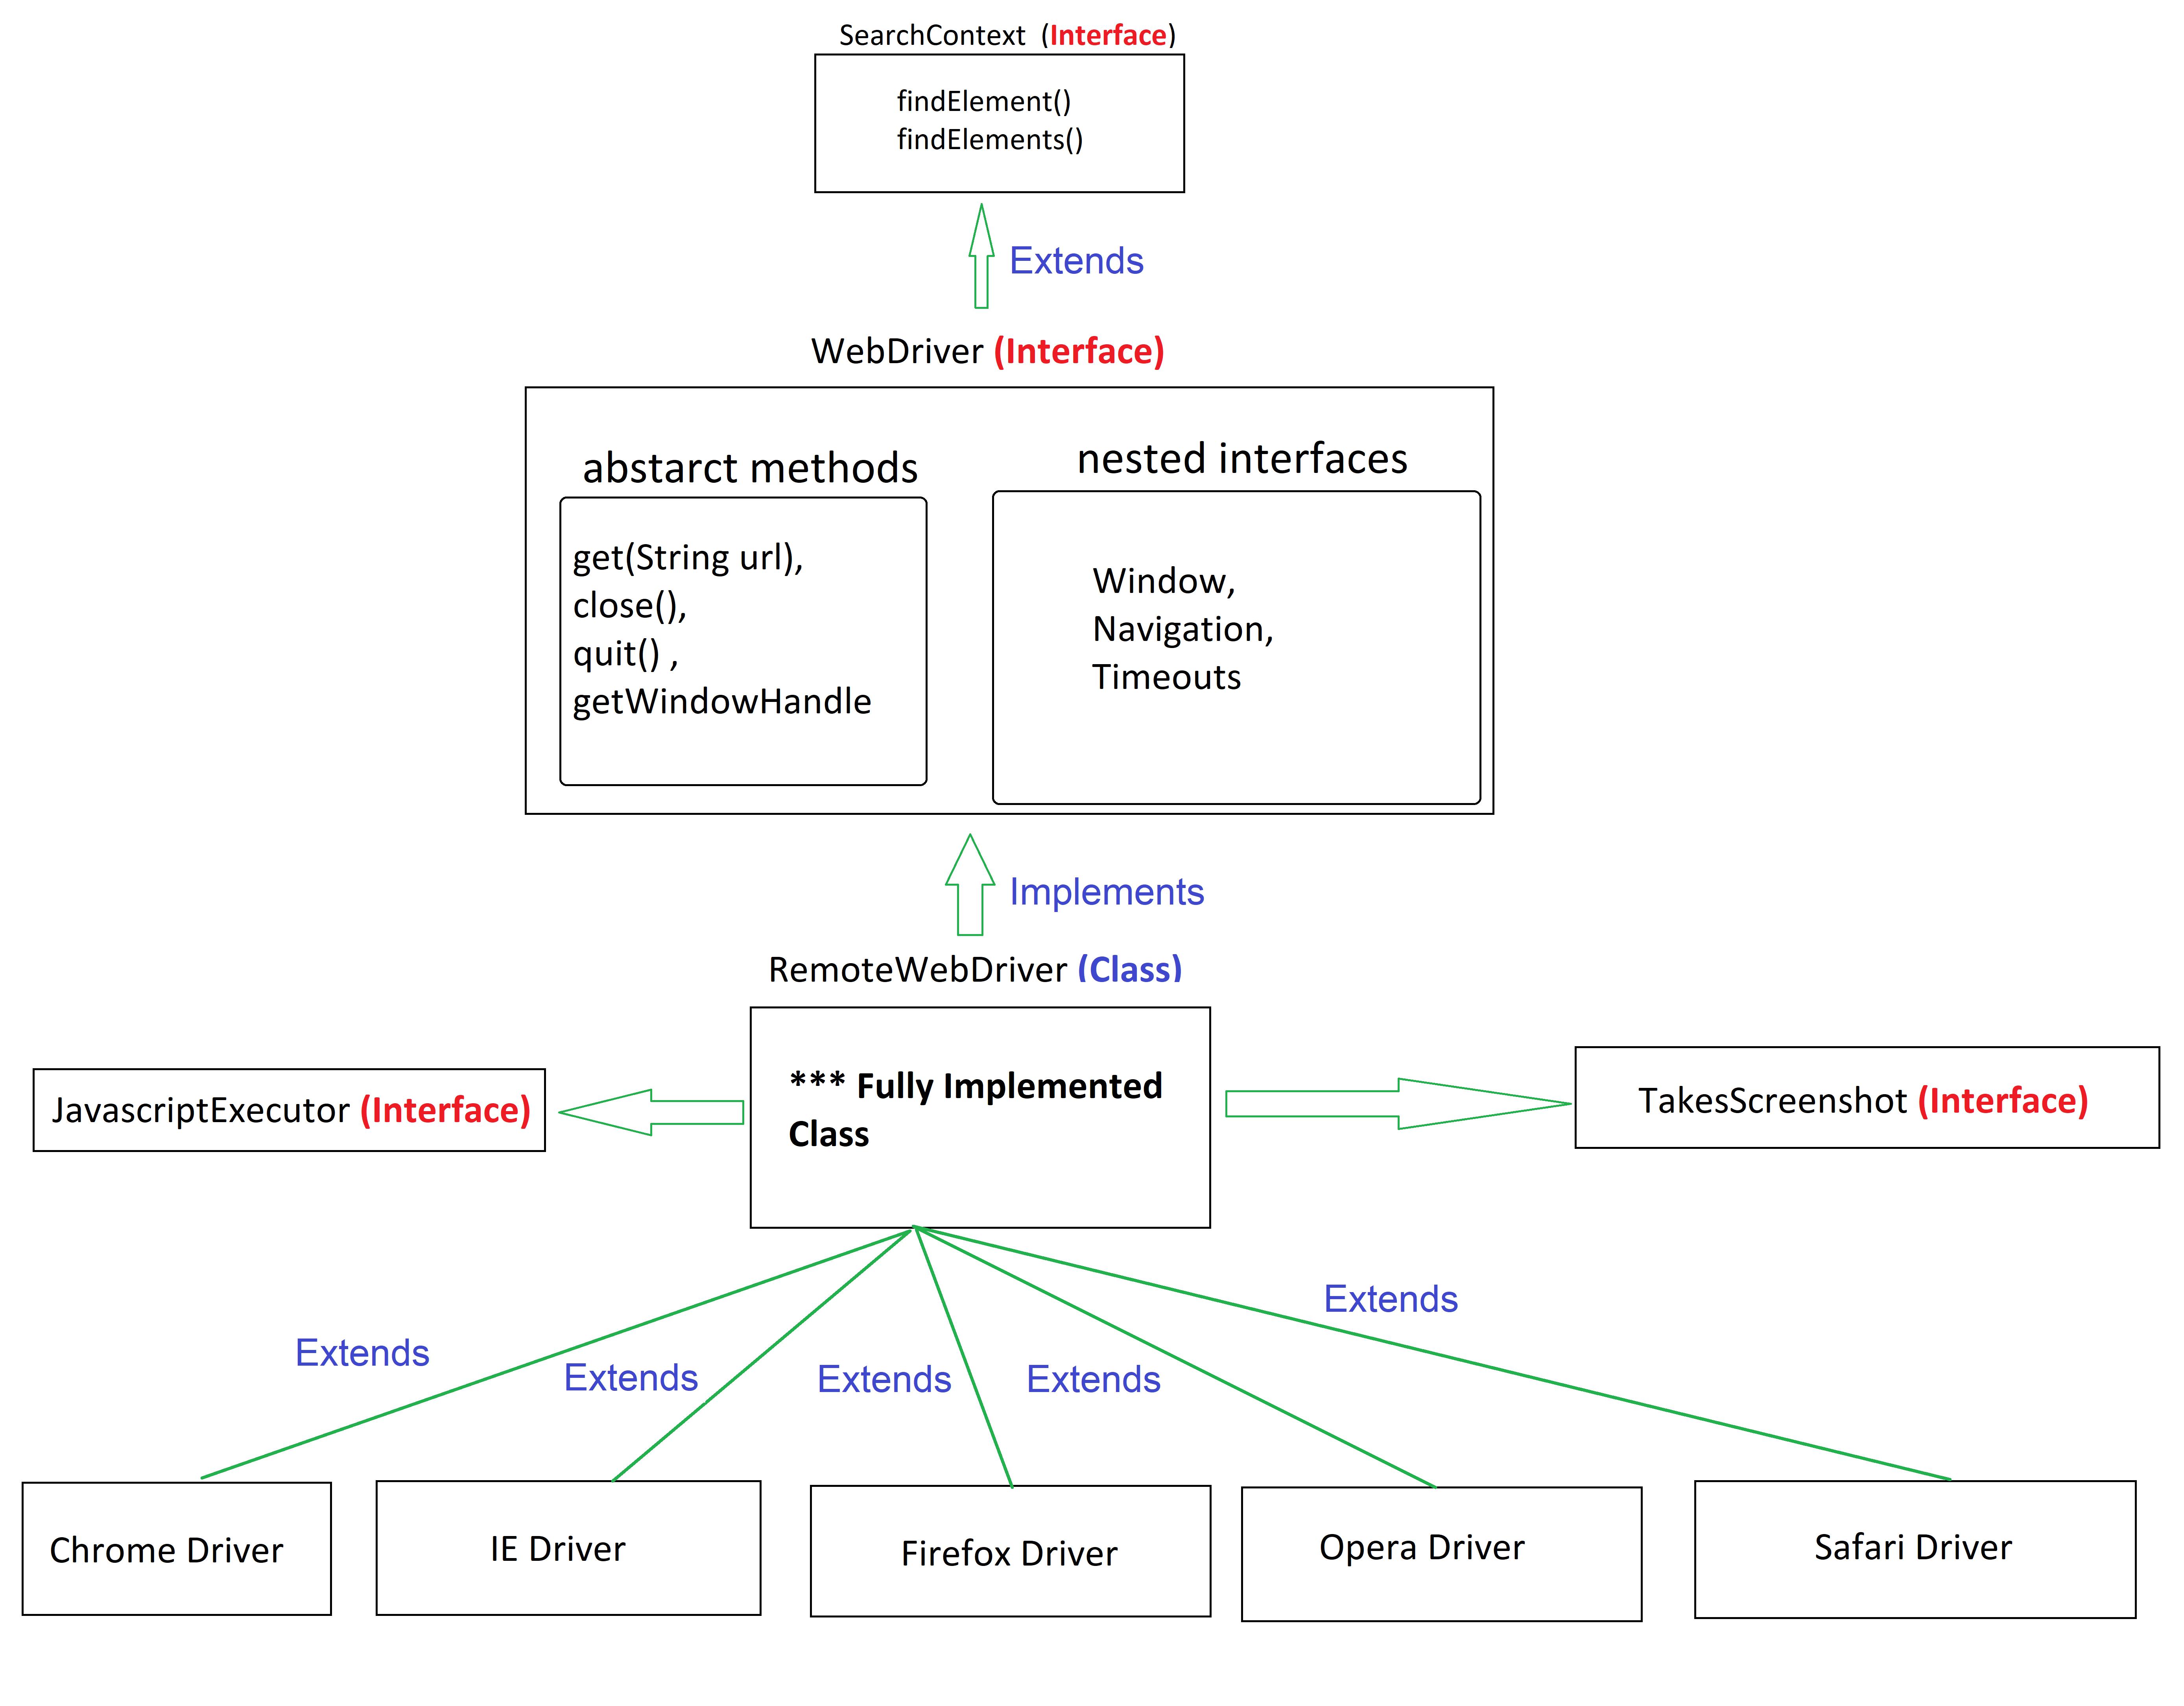 selenium webdriver interface